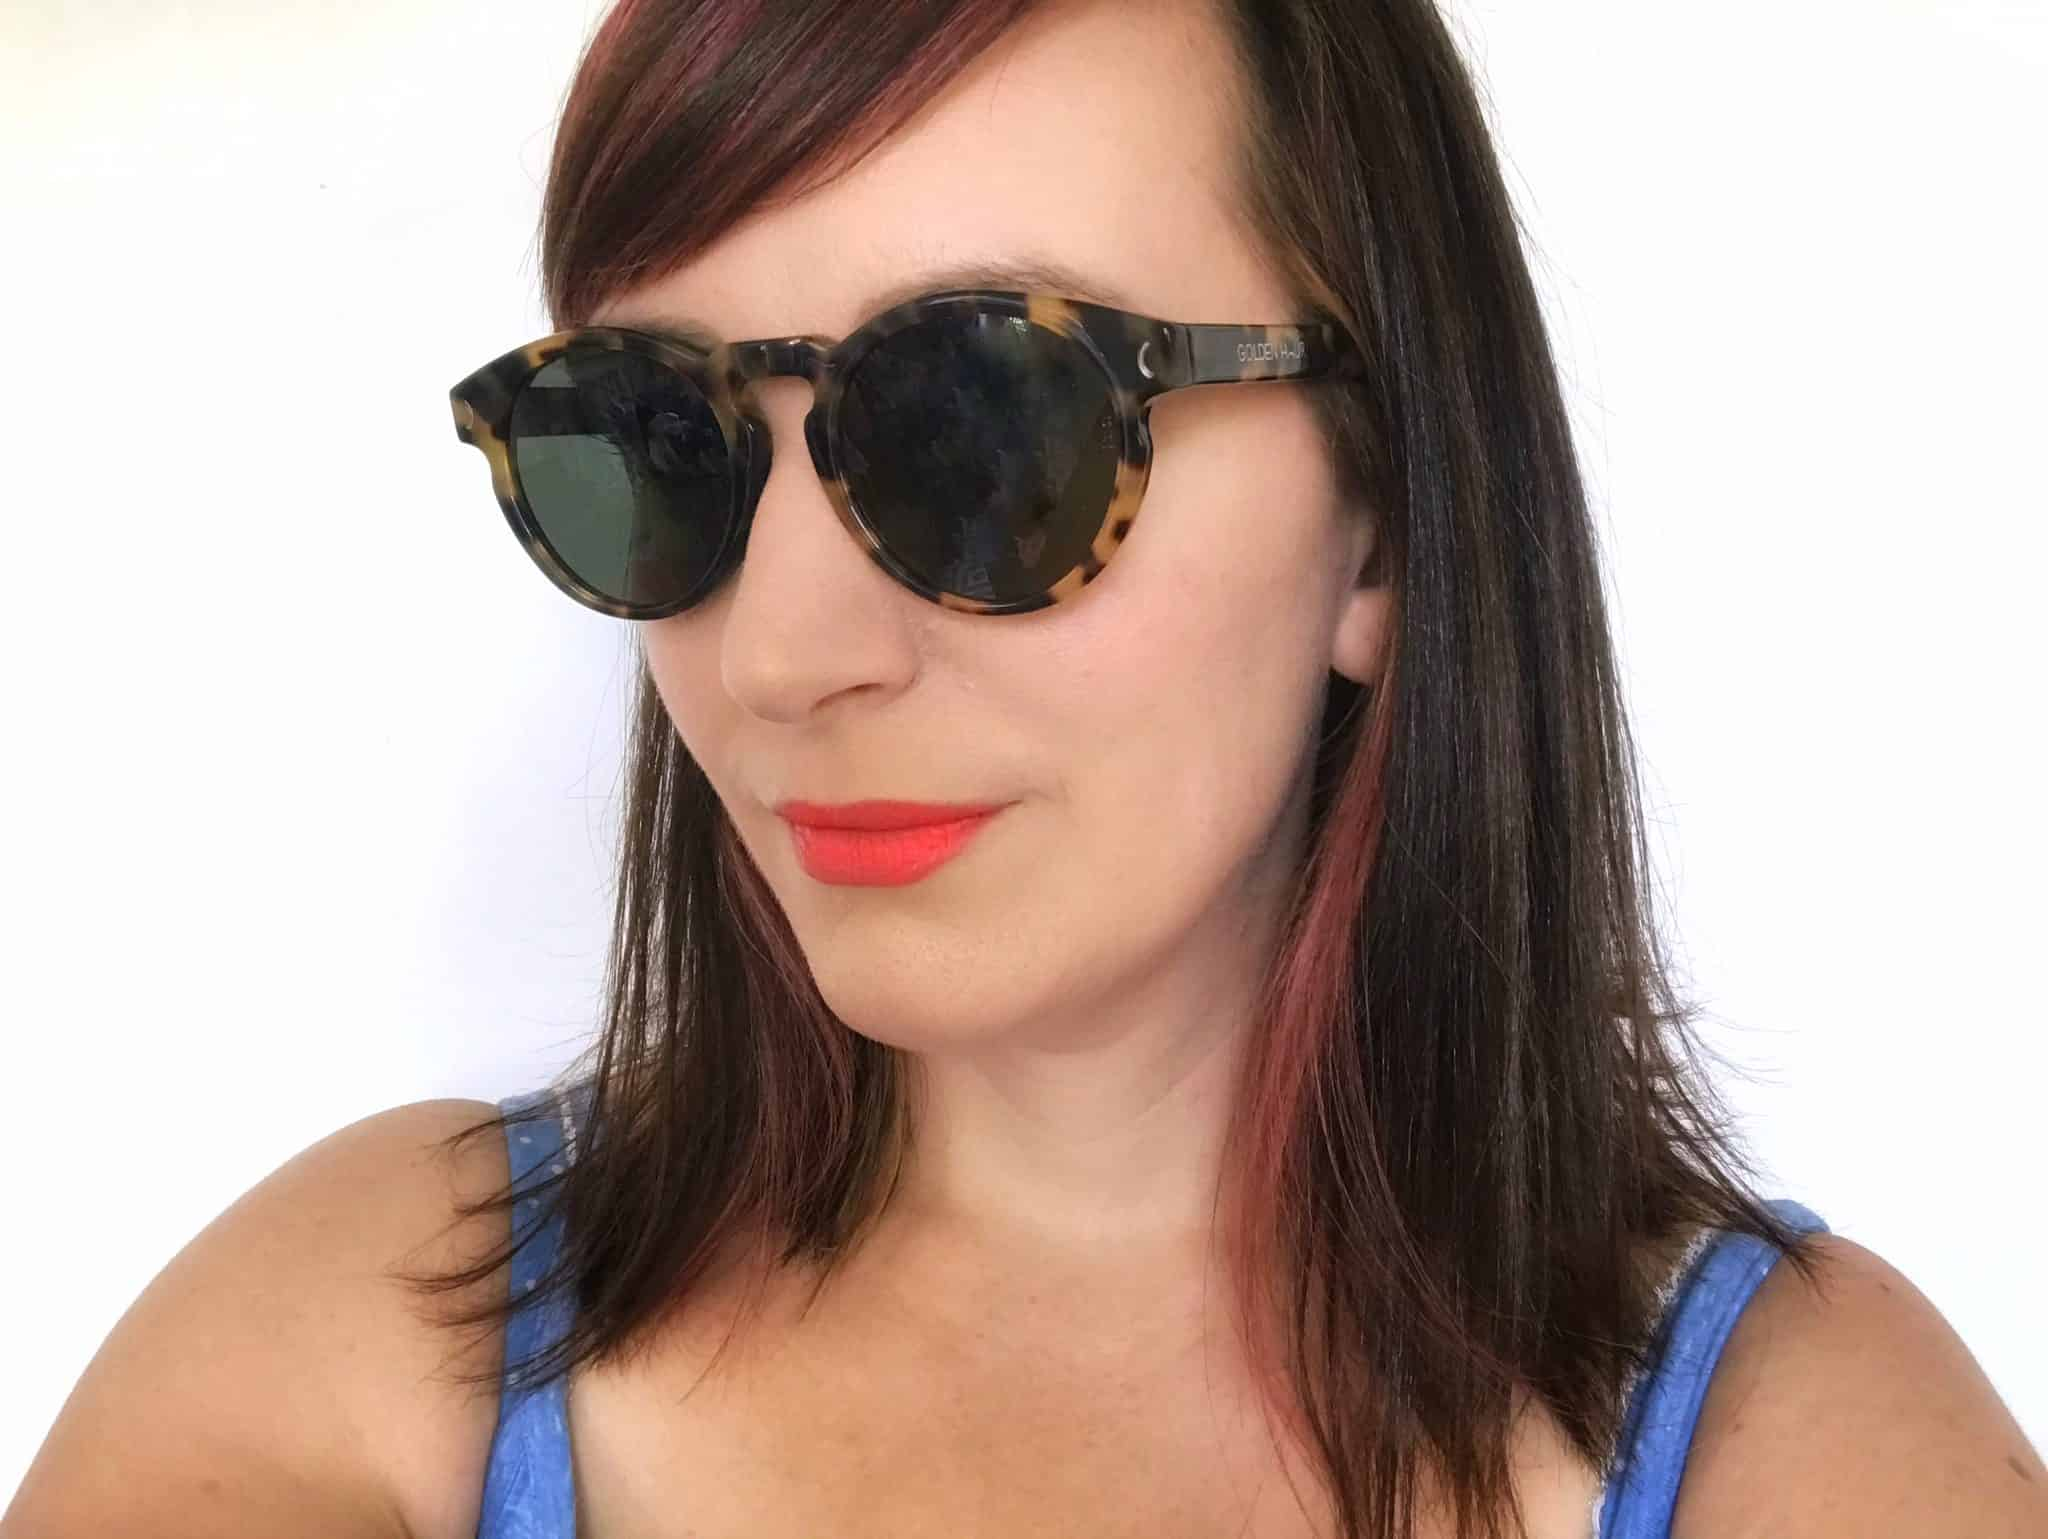 Wearing Golden Hour sunglasses